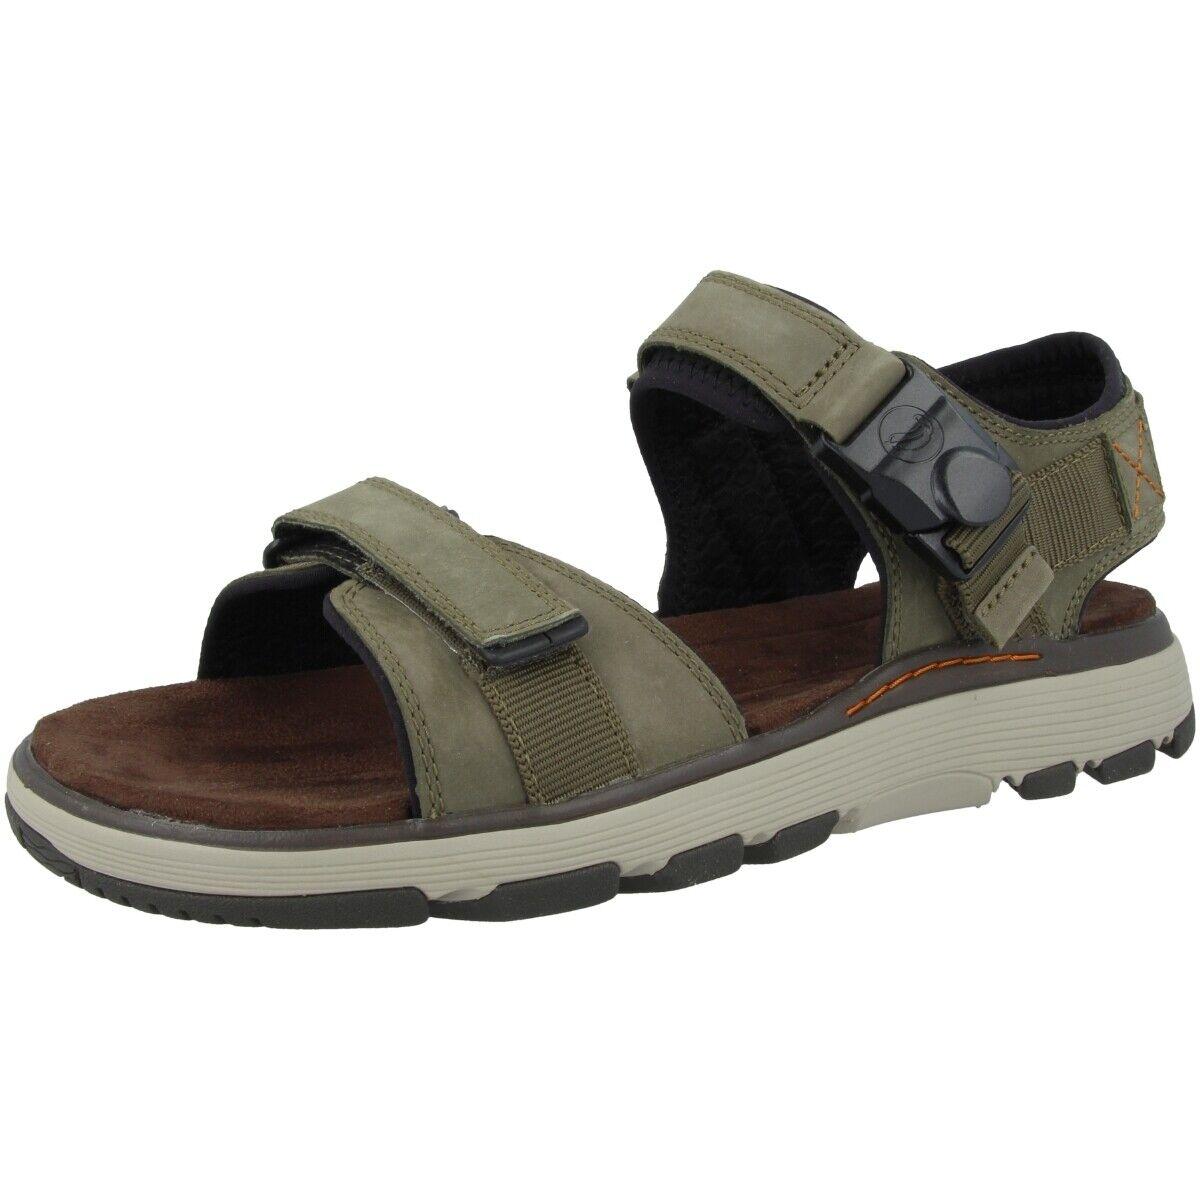 Clarks un trek part uomo  scarpe sandals hiking trail light sandal  offerta speciale